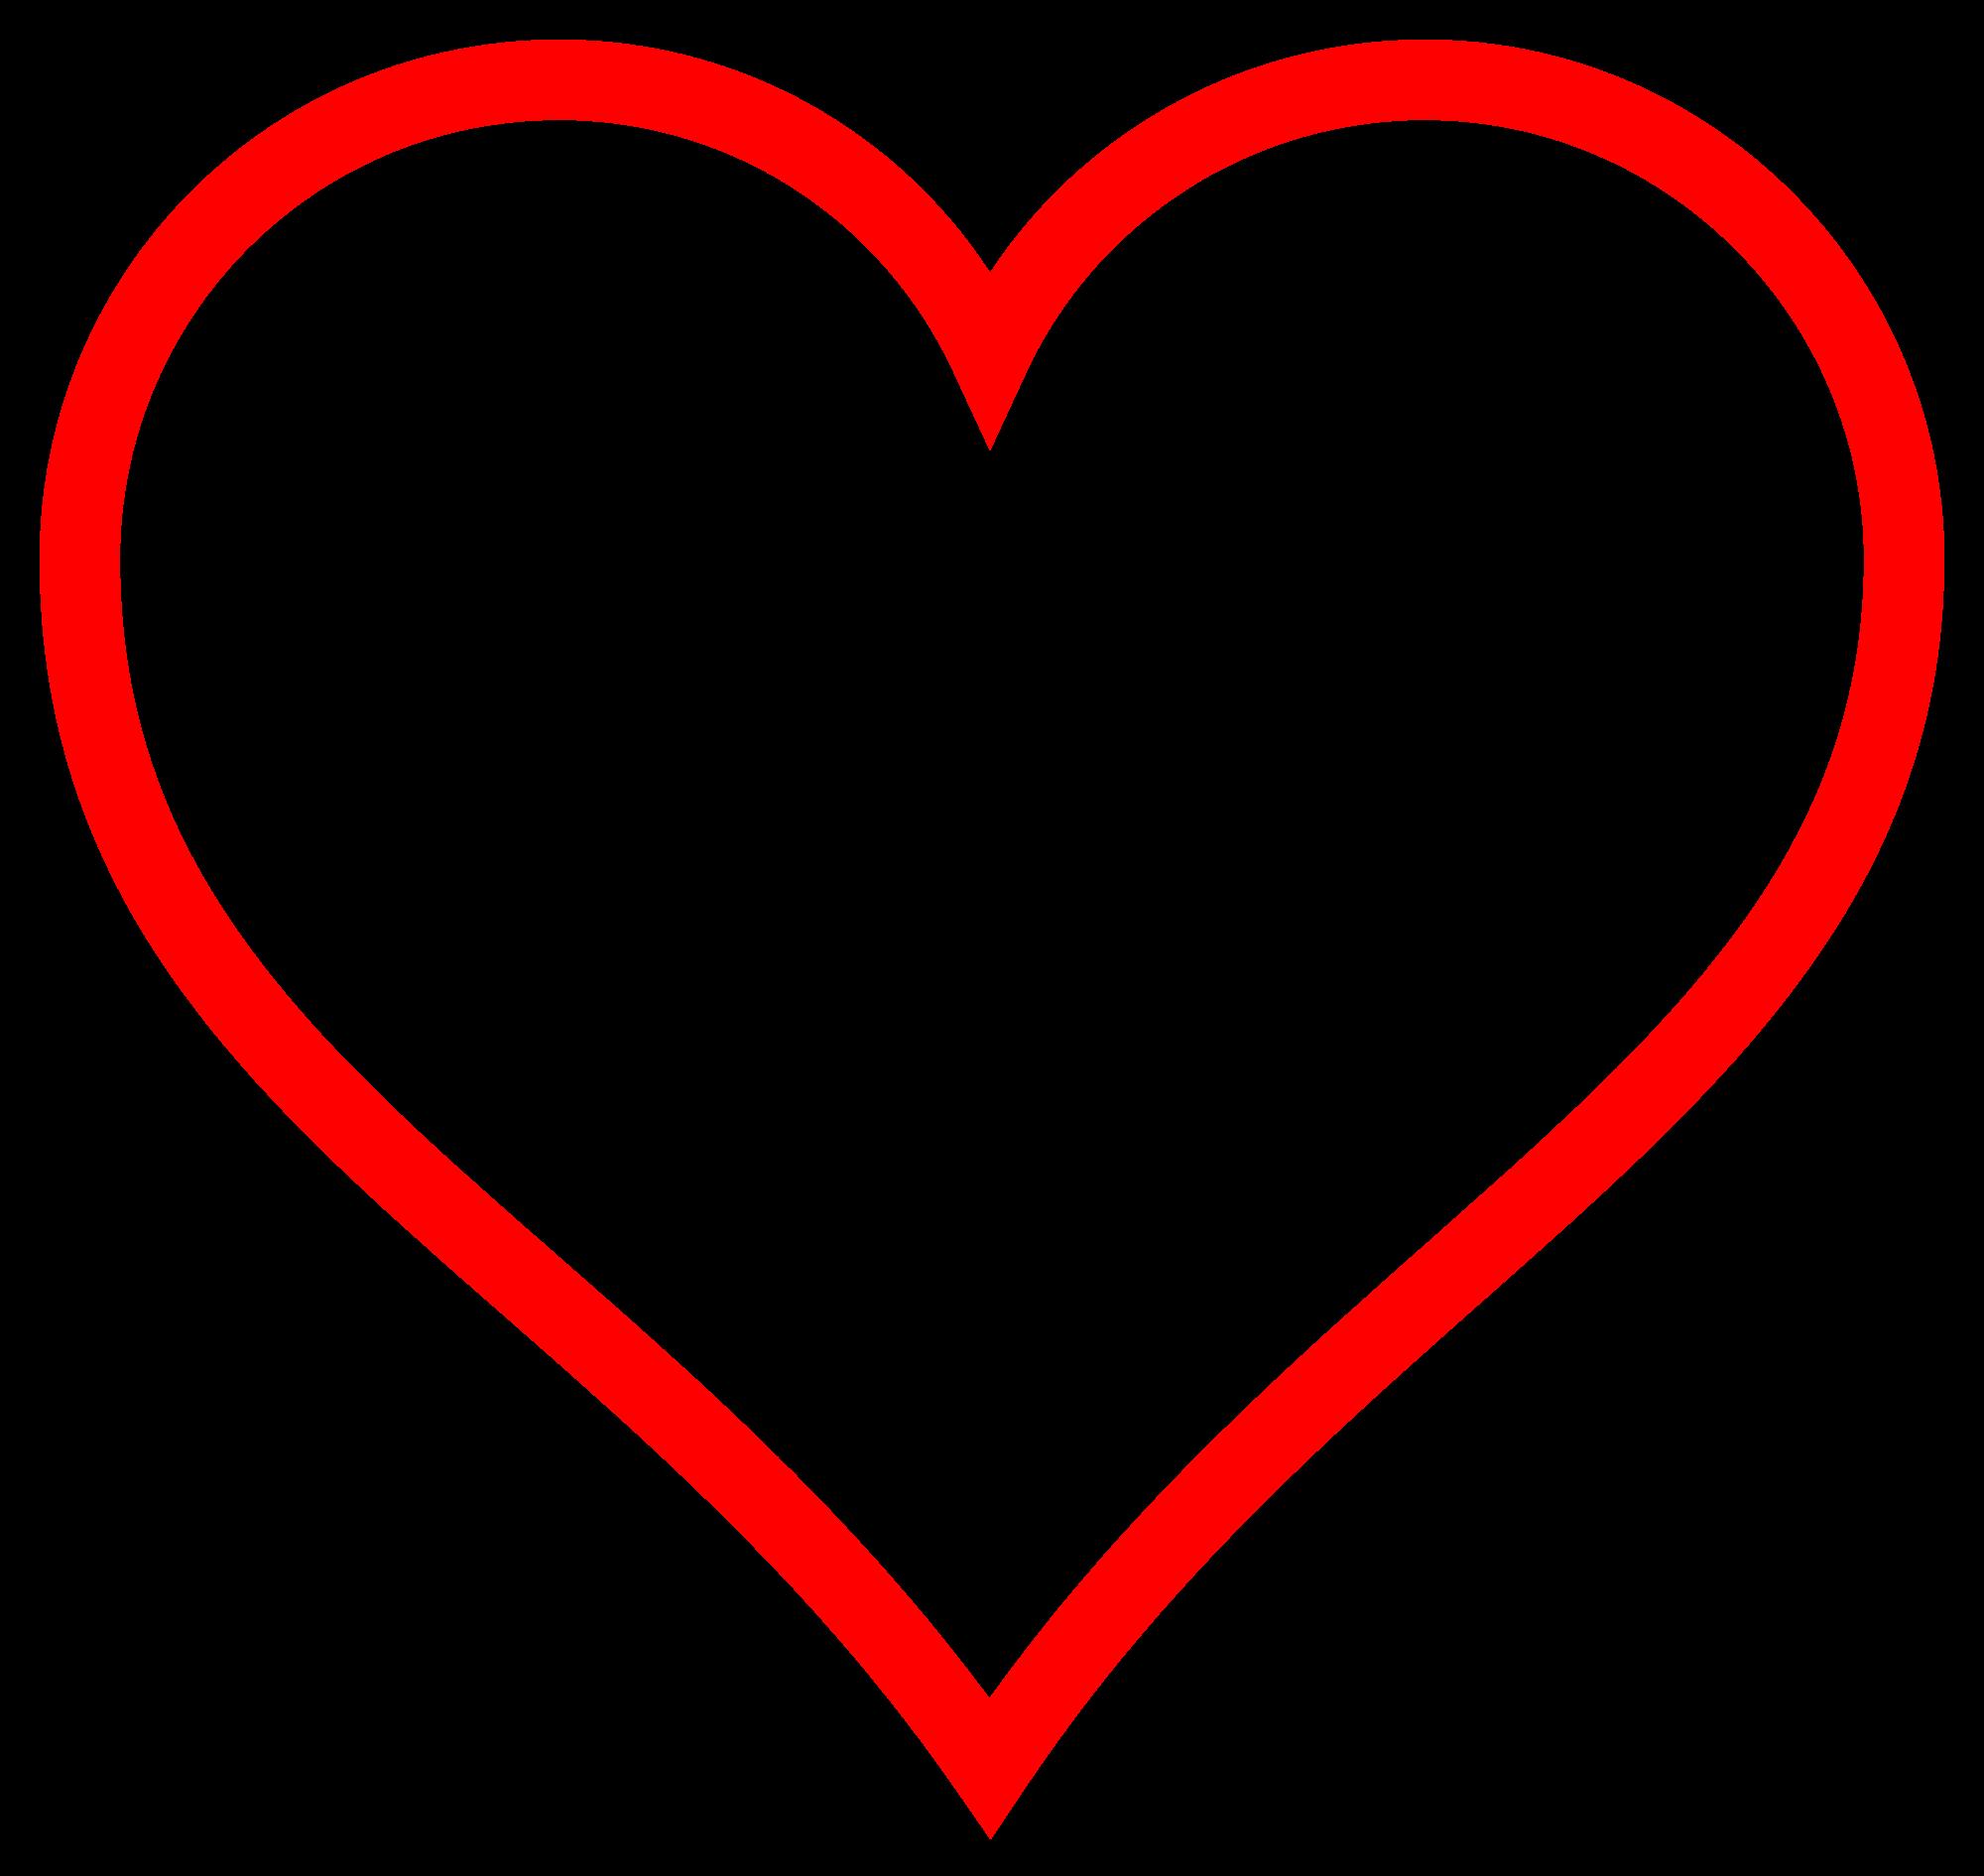 Icon Heart Photo